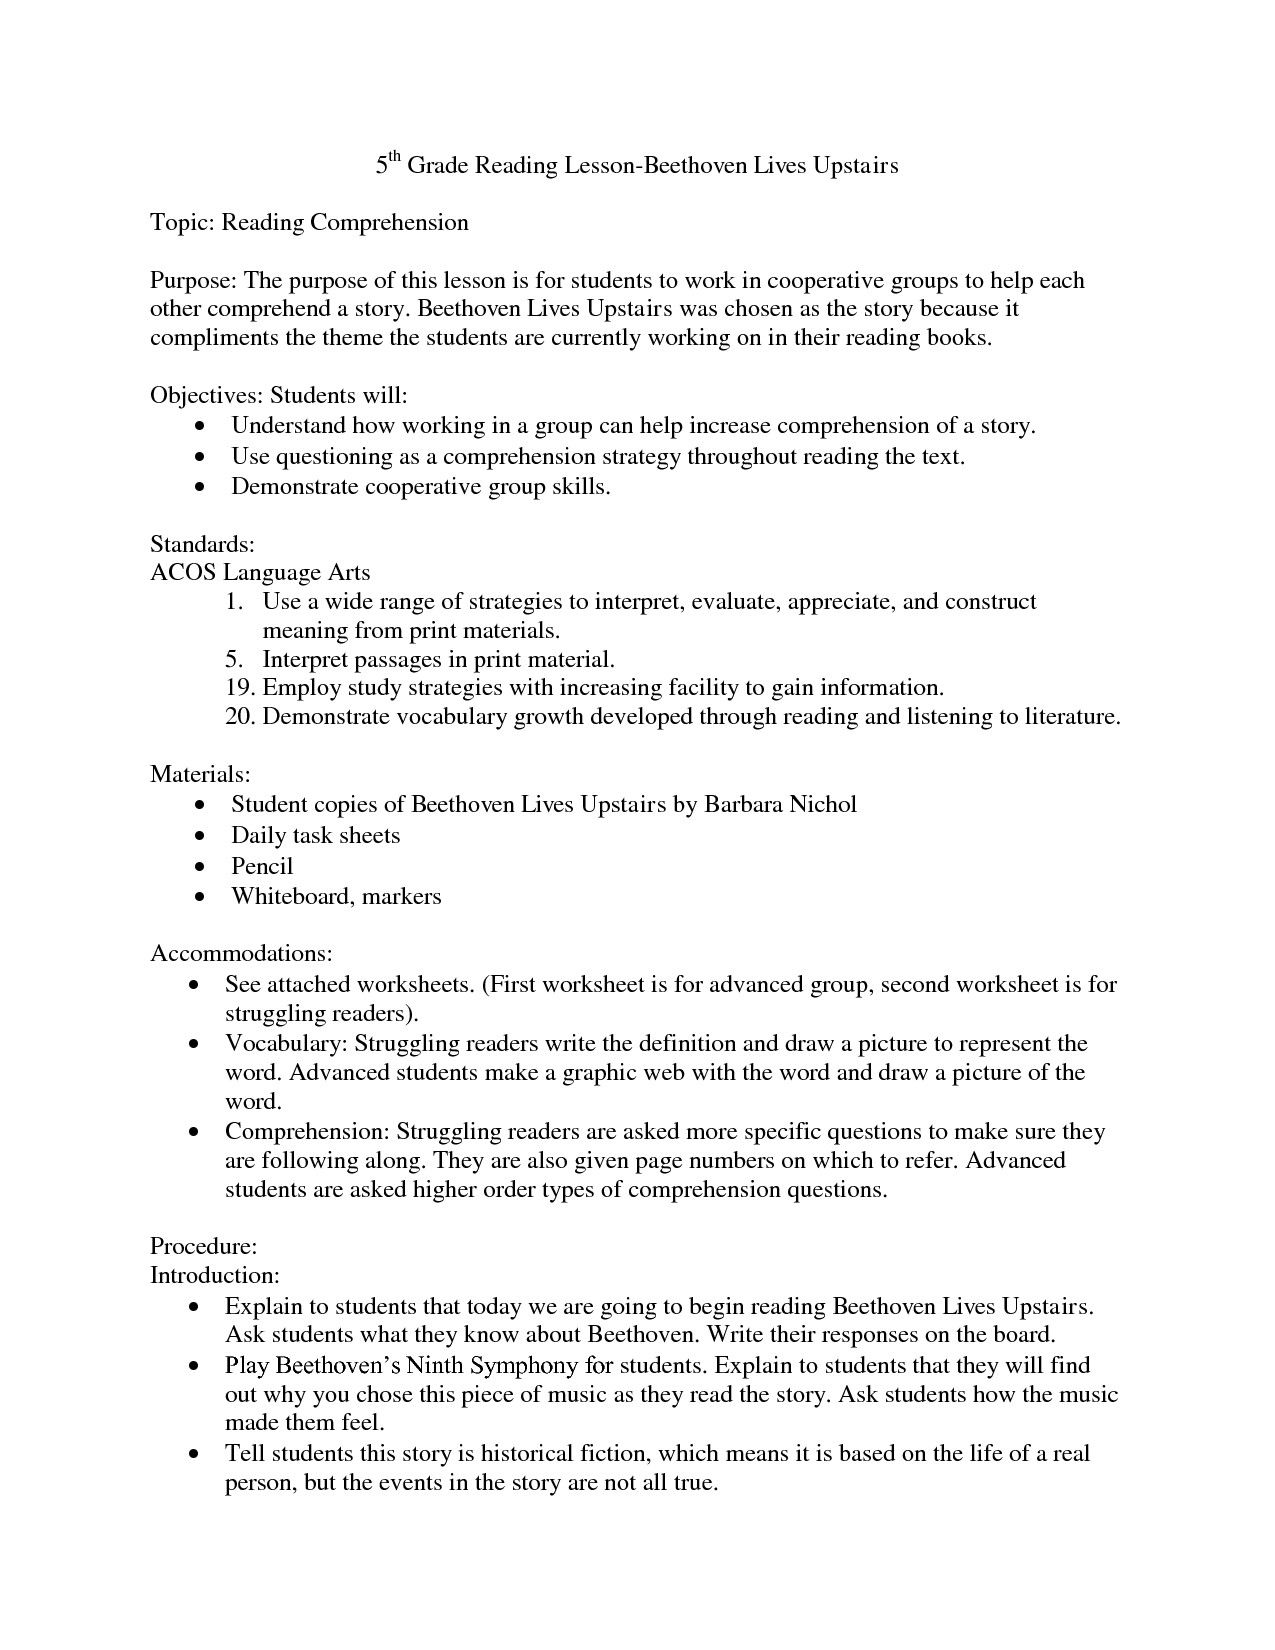 5th Grade Free Printable Worksheets